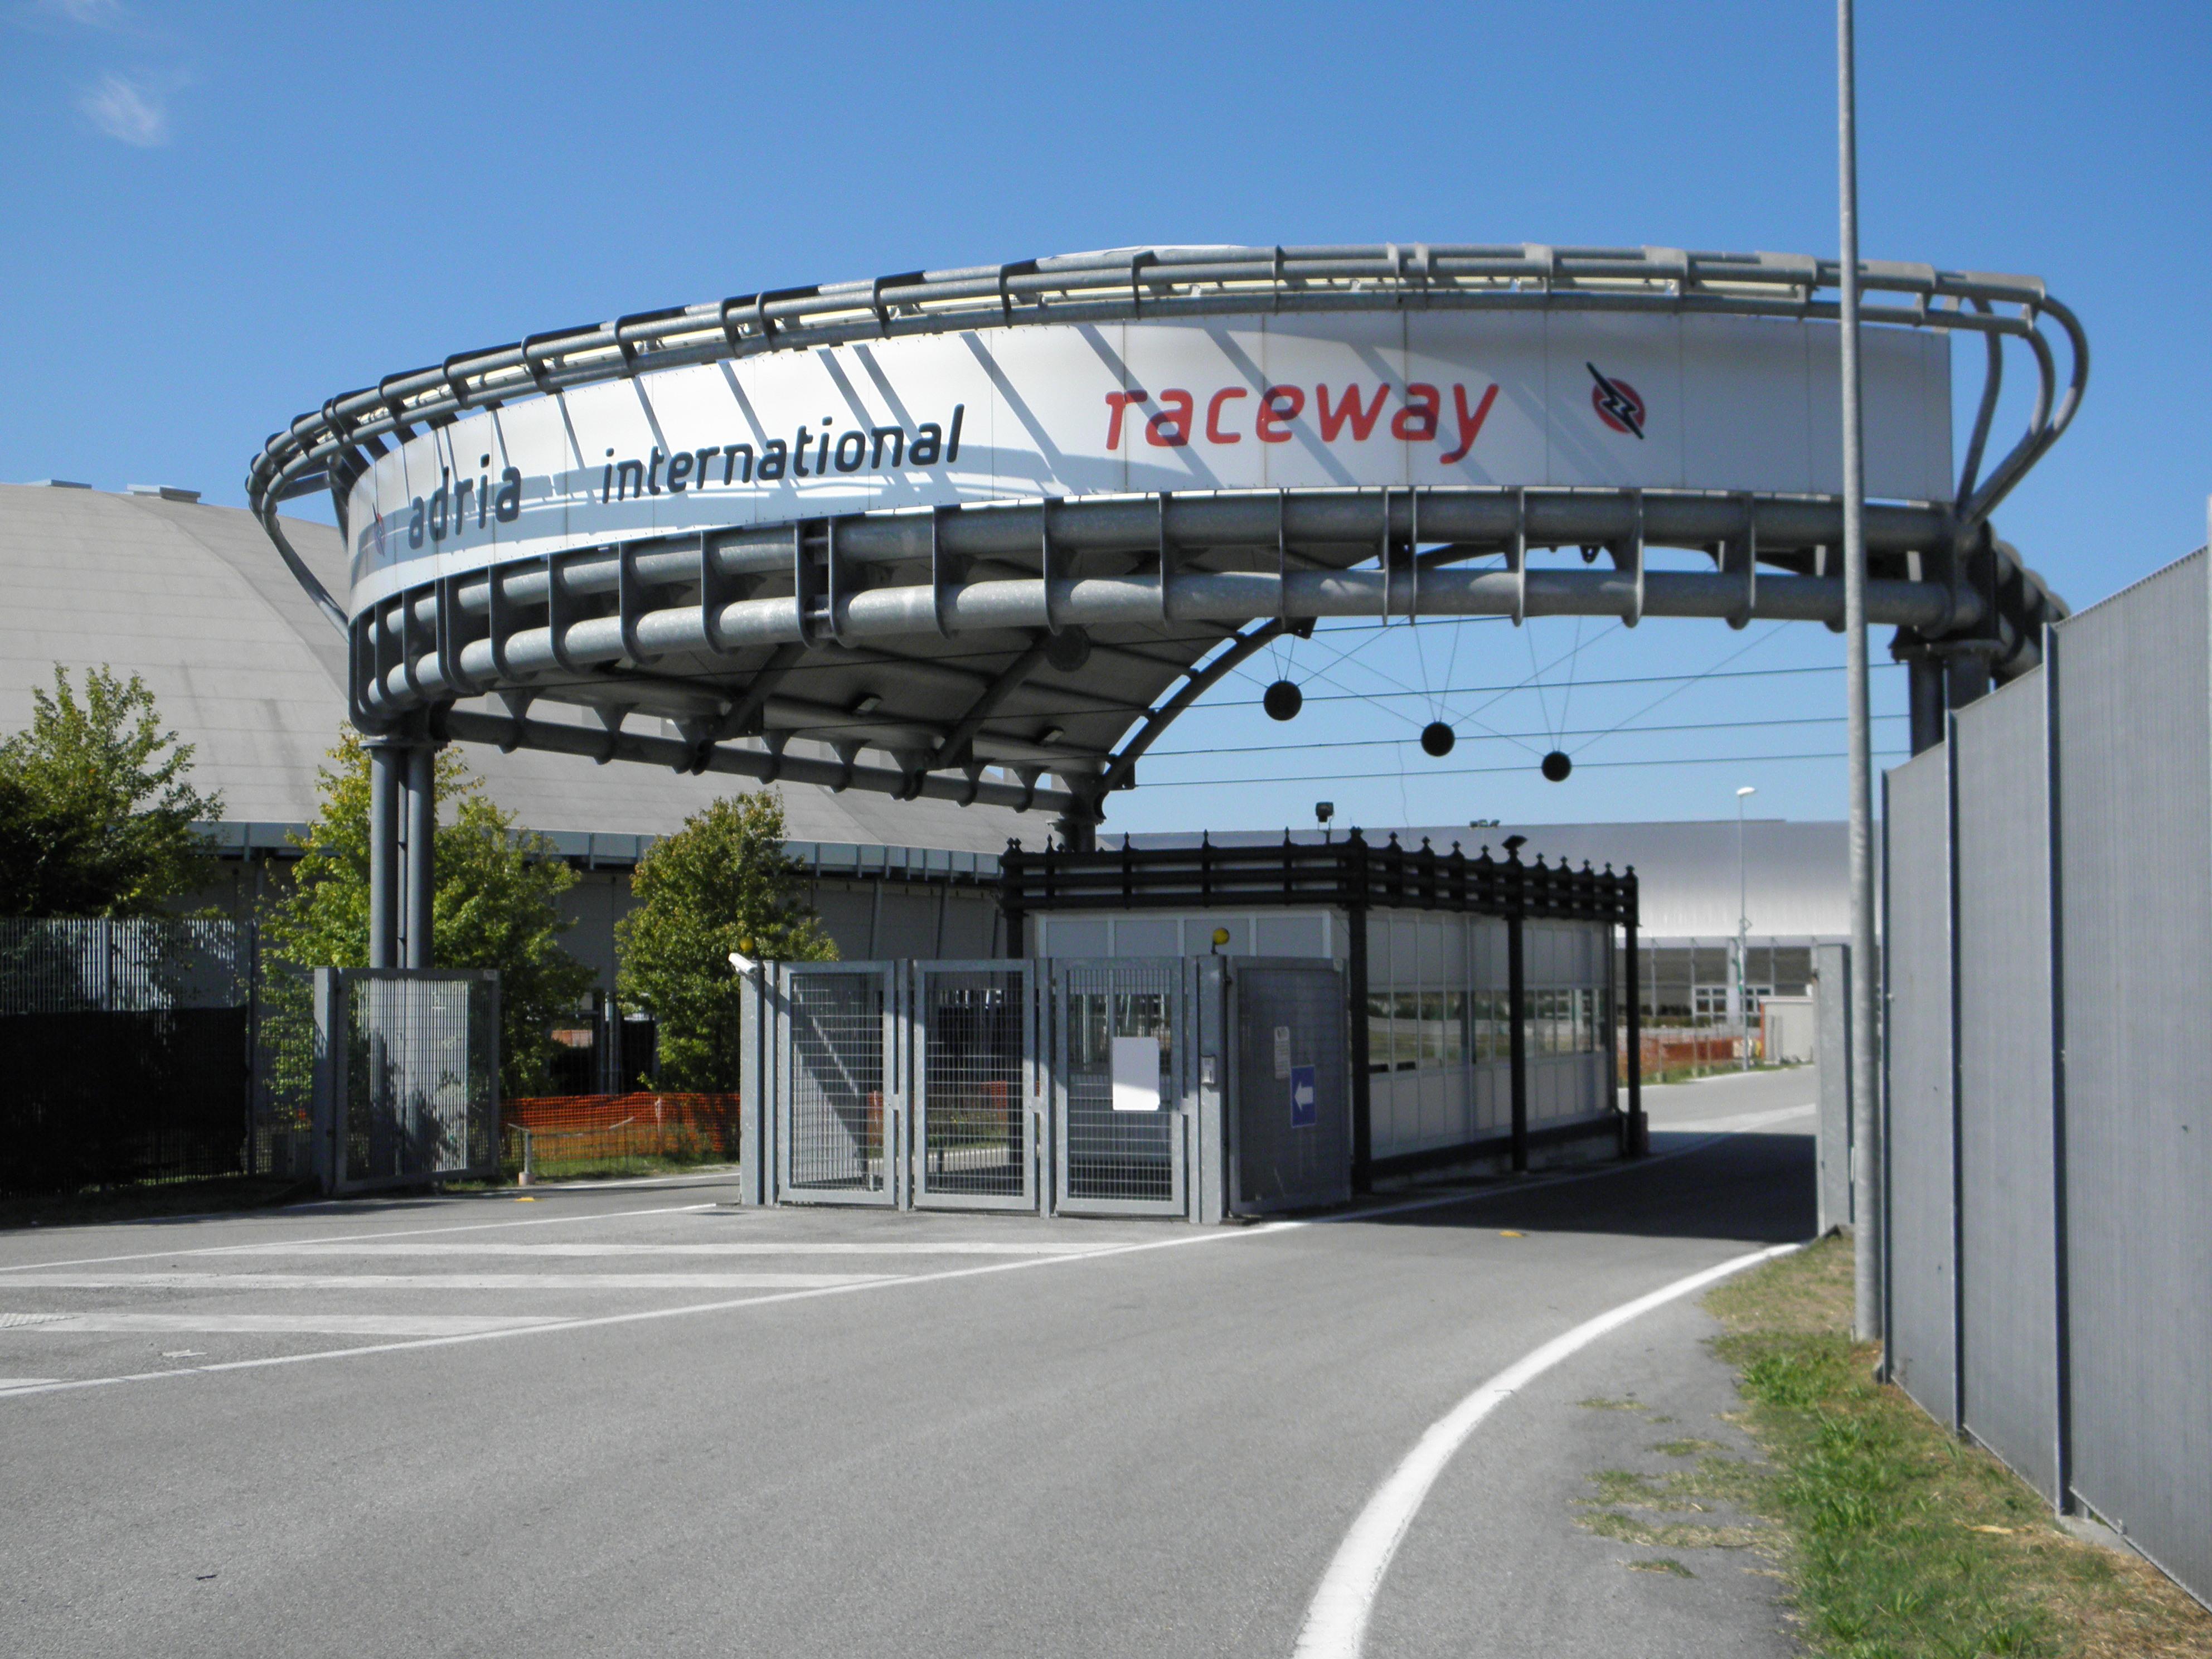 Circuito Adria : File adria international raceway front gate g wikimedia commons